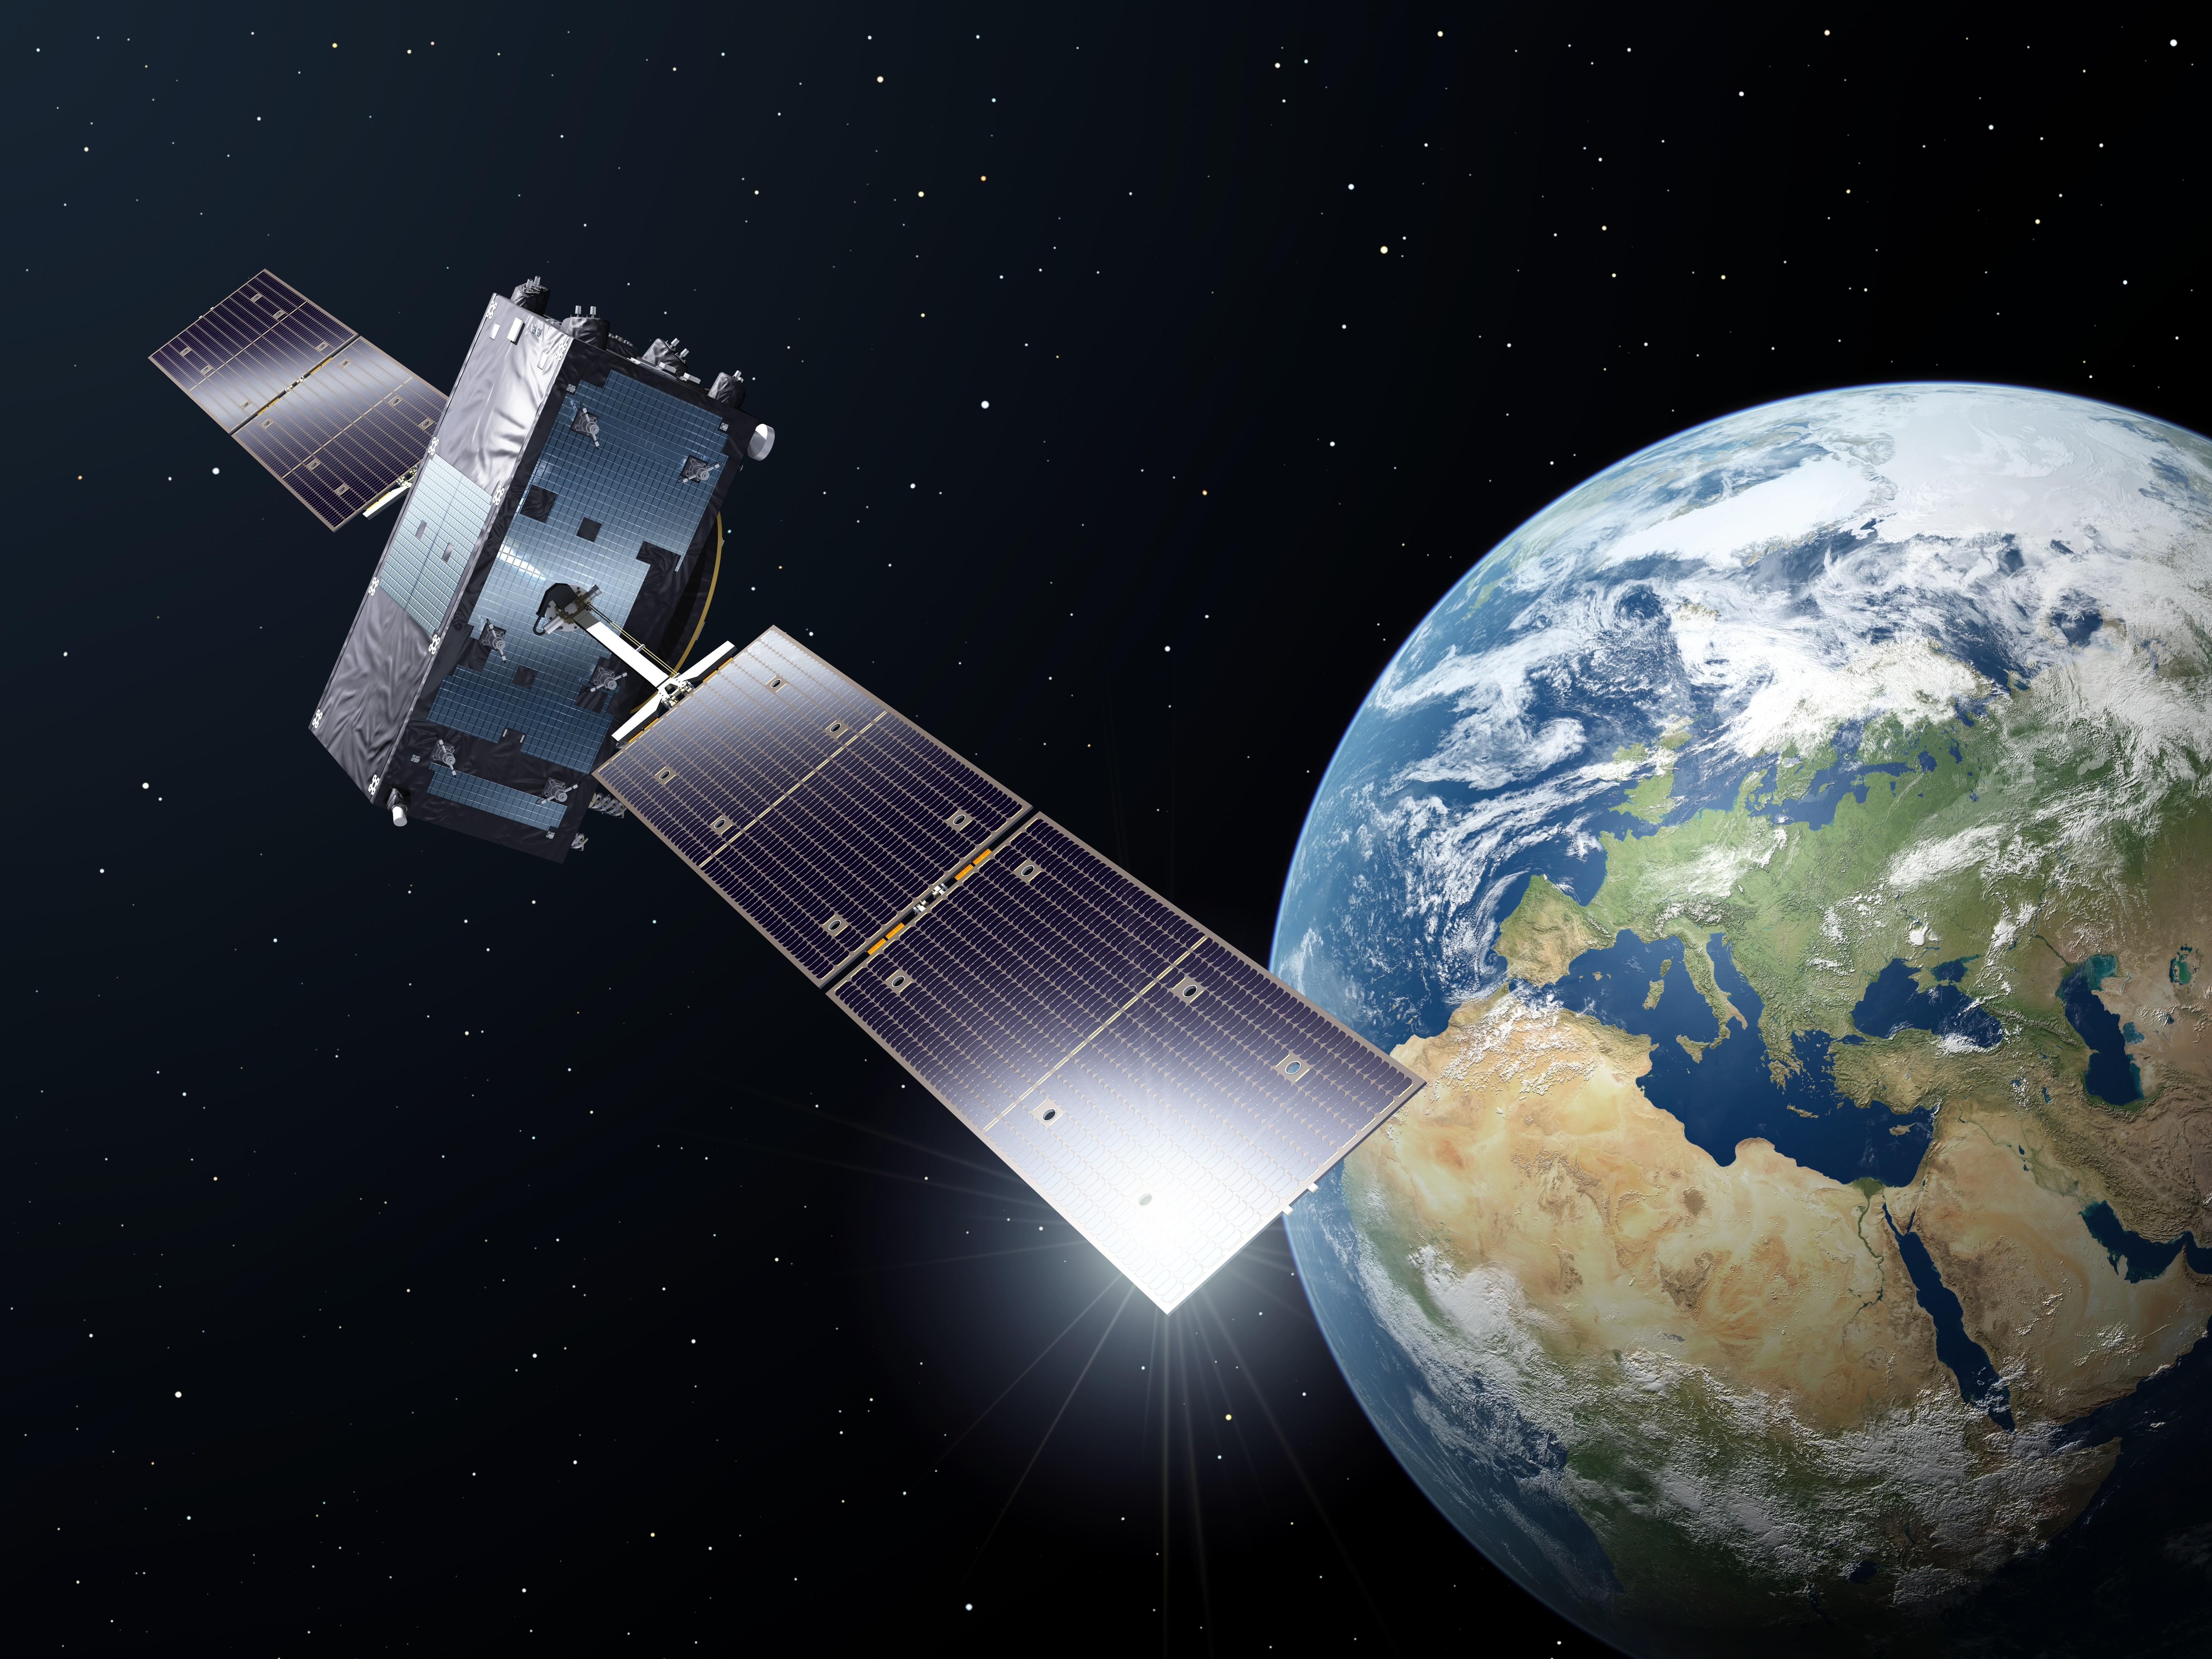 galileo_satellite_in_orbit.jpg